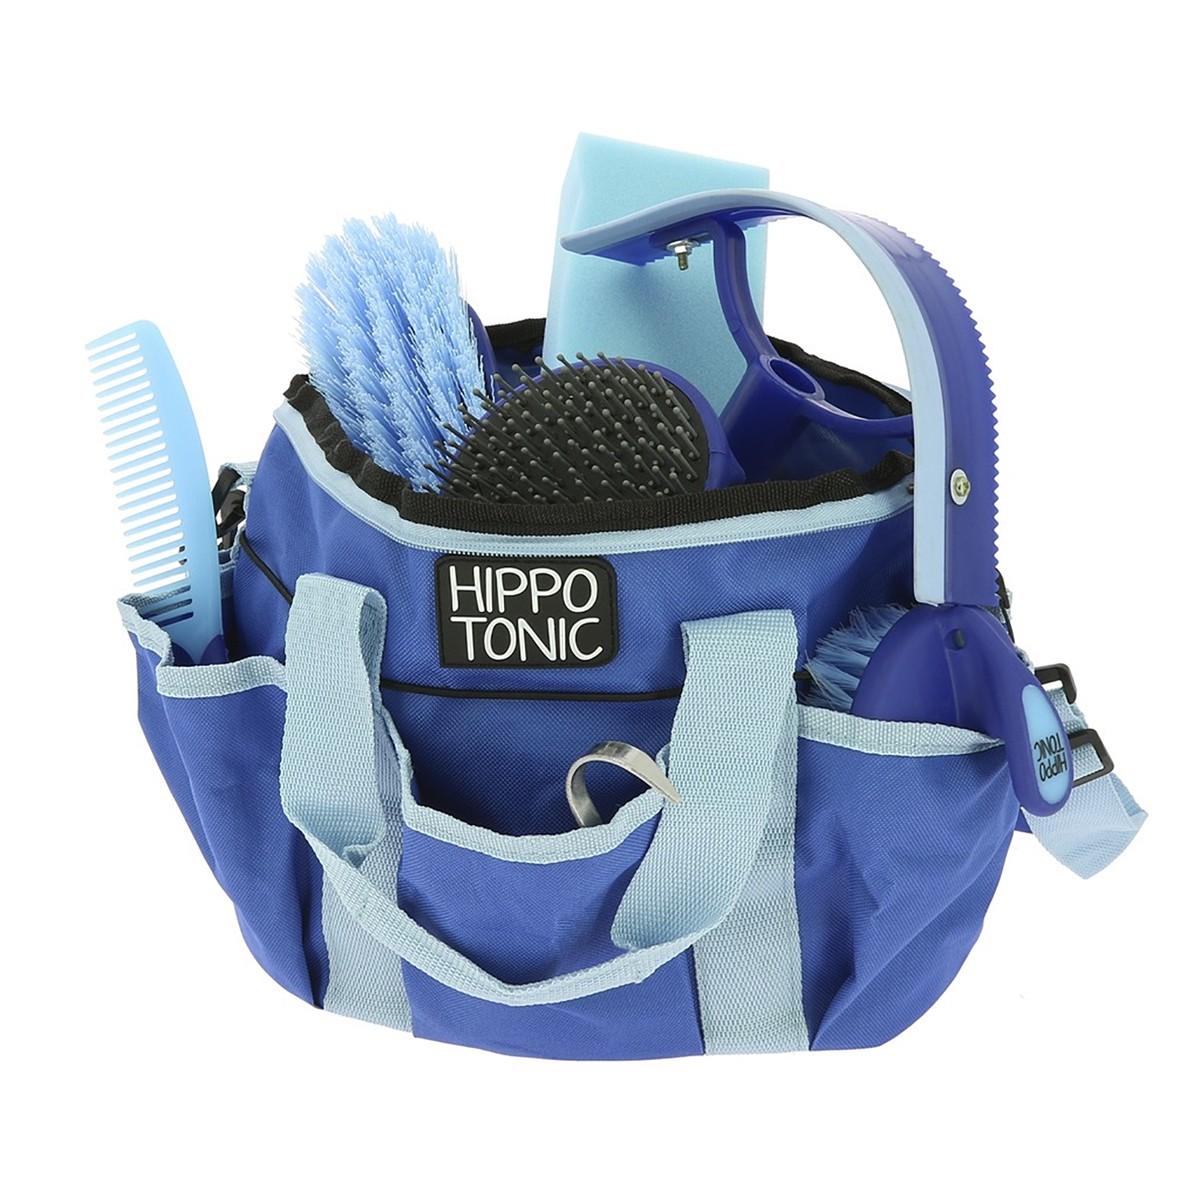 Hippotonic Pro 3 Blue Grooming Kit & Bag